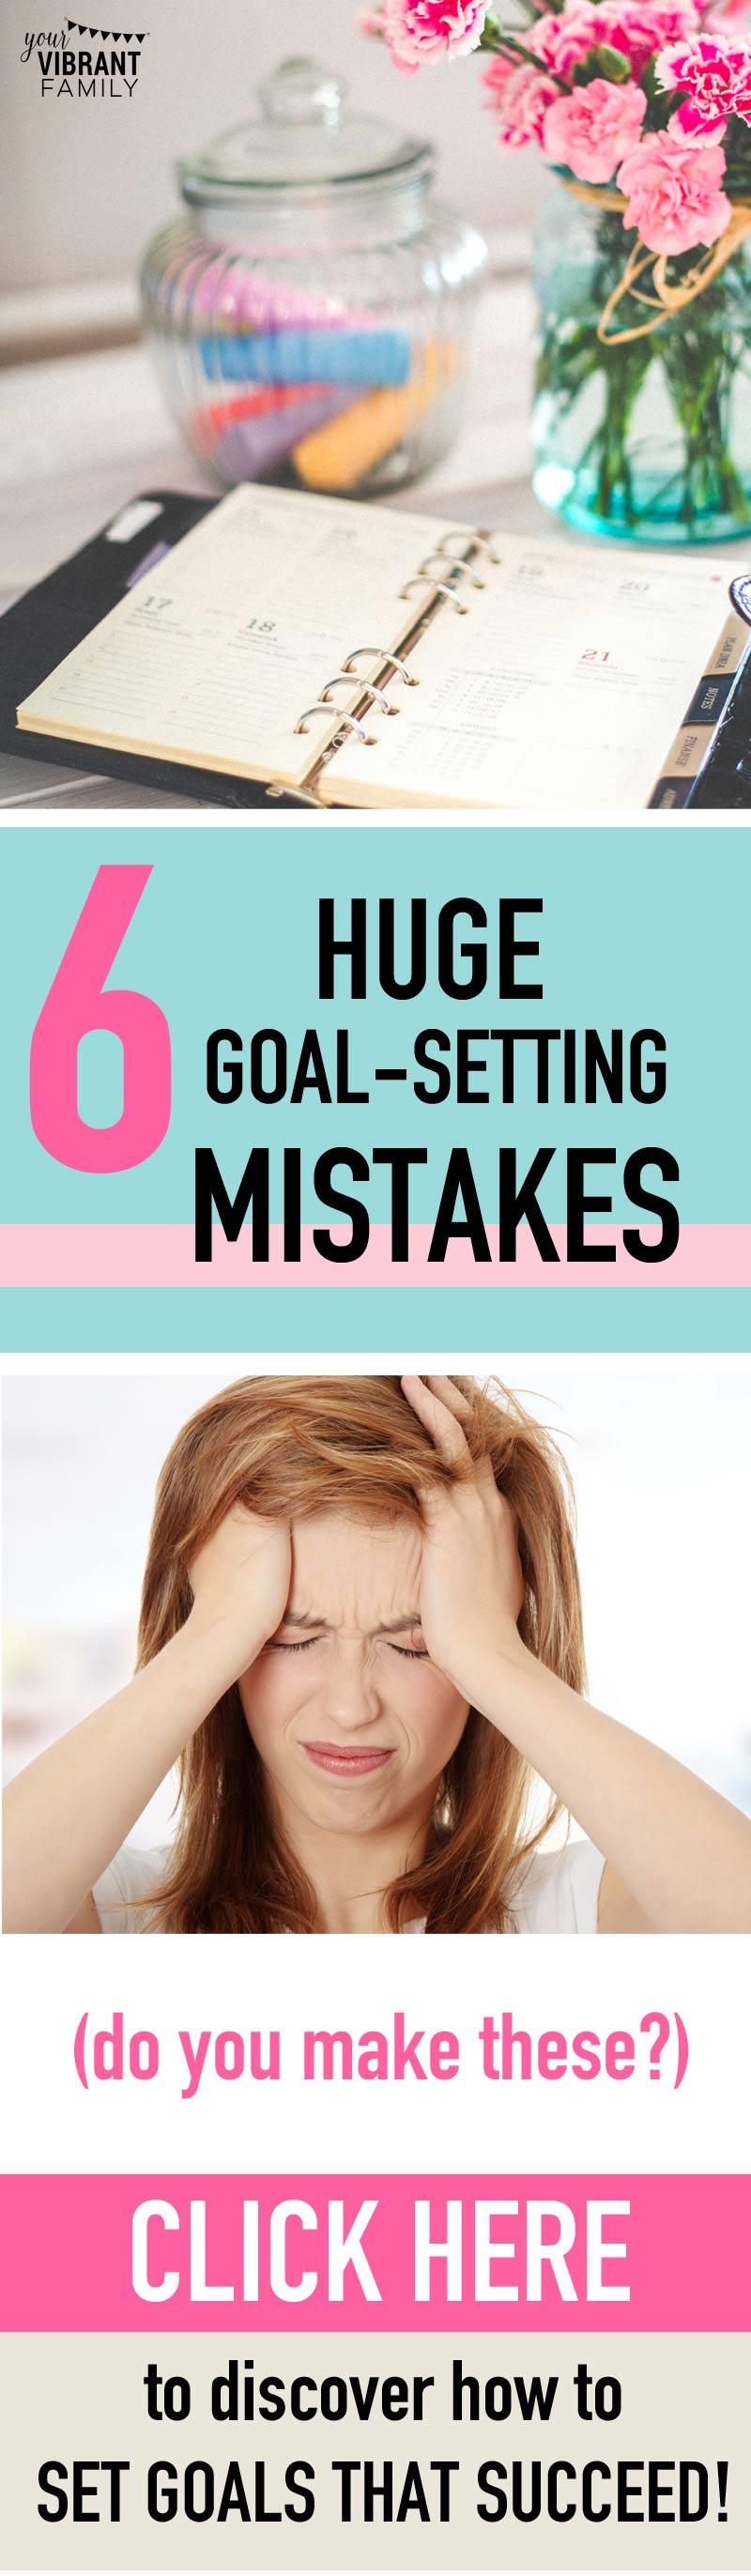 goal setting mistakes | goal setting | goal setting worksheet | setting goals | effective goal setting | the goal setting | setting goals | tips on setting goals |